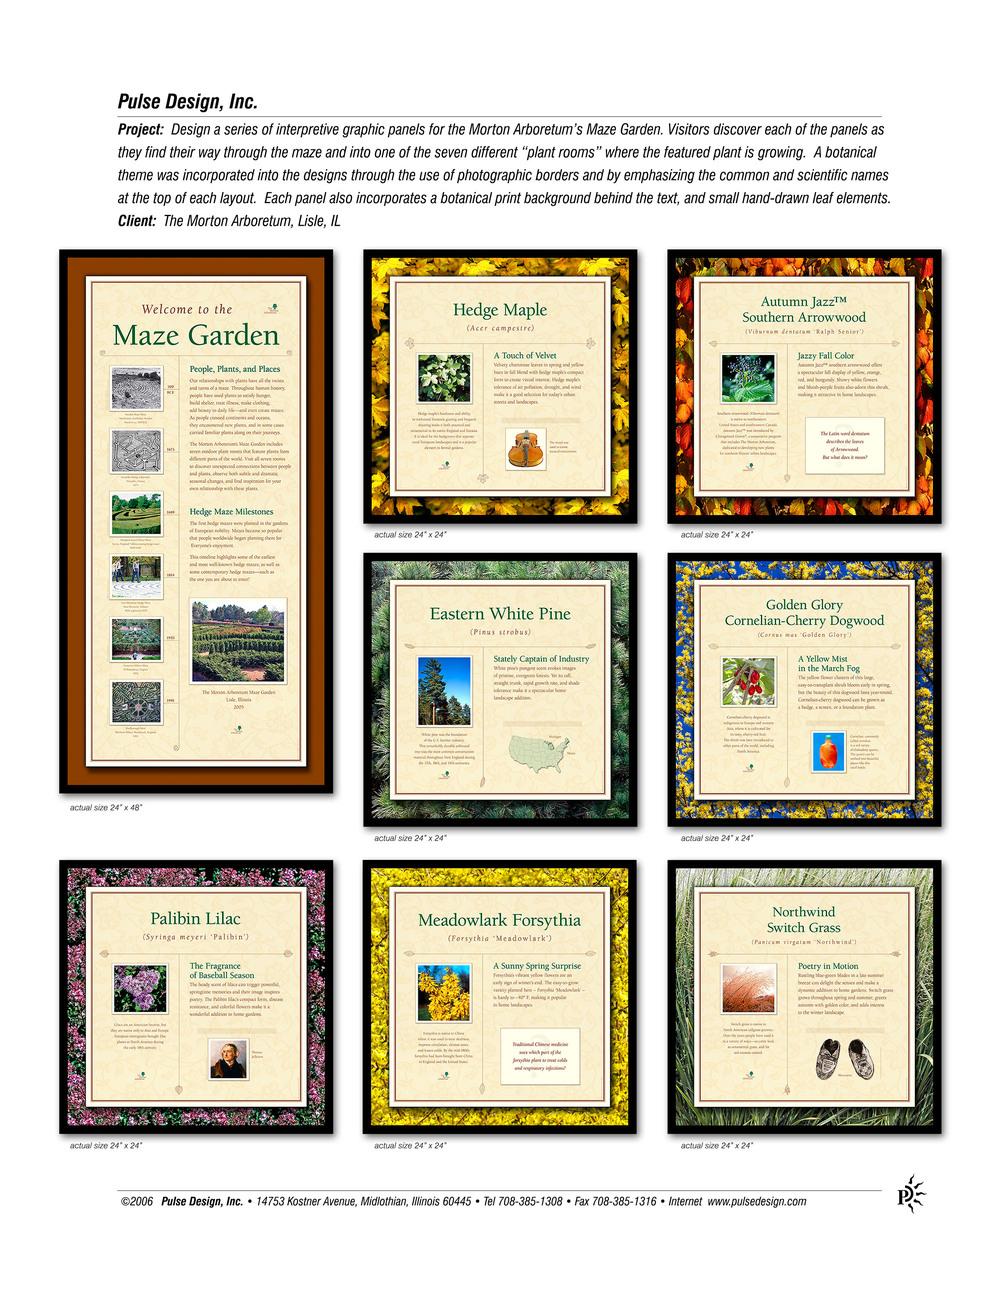 Morton-Arboretum-Maze-Garden-Signs-Pulse-Design-Inc.jpg